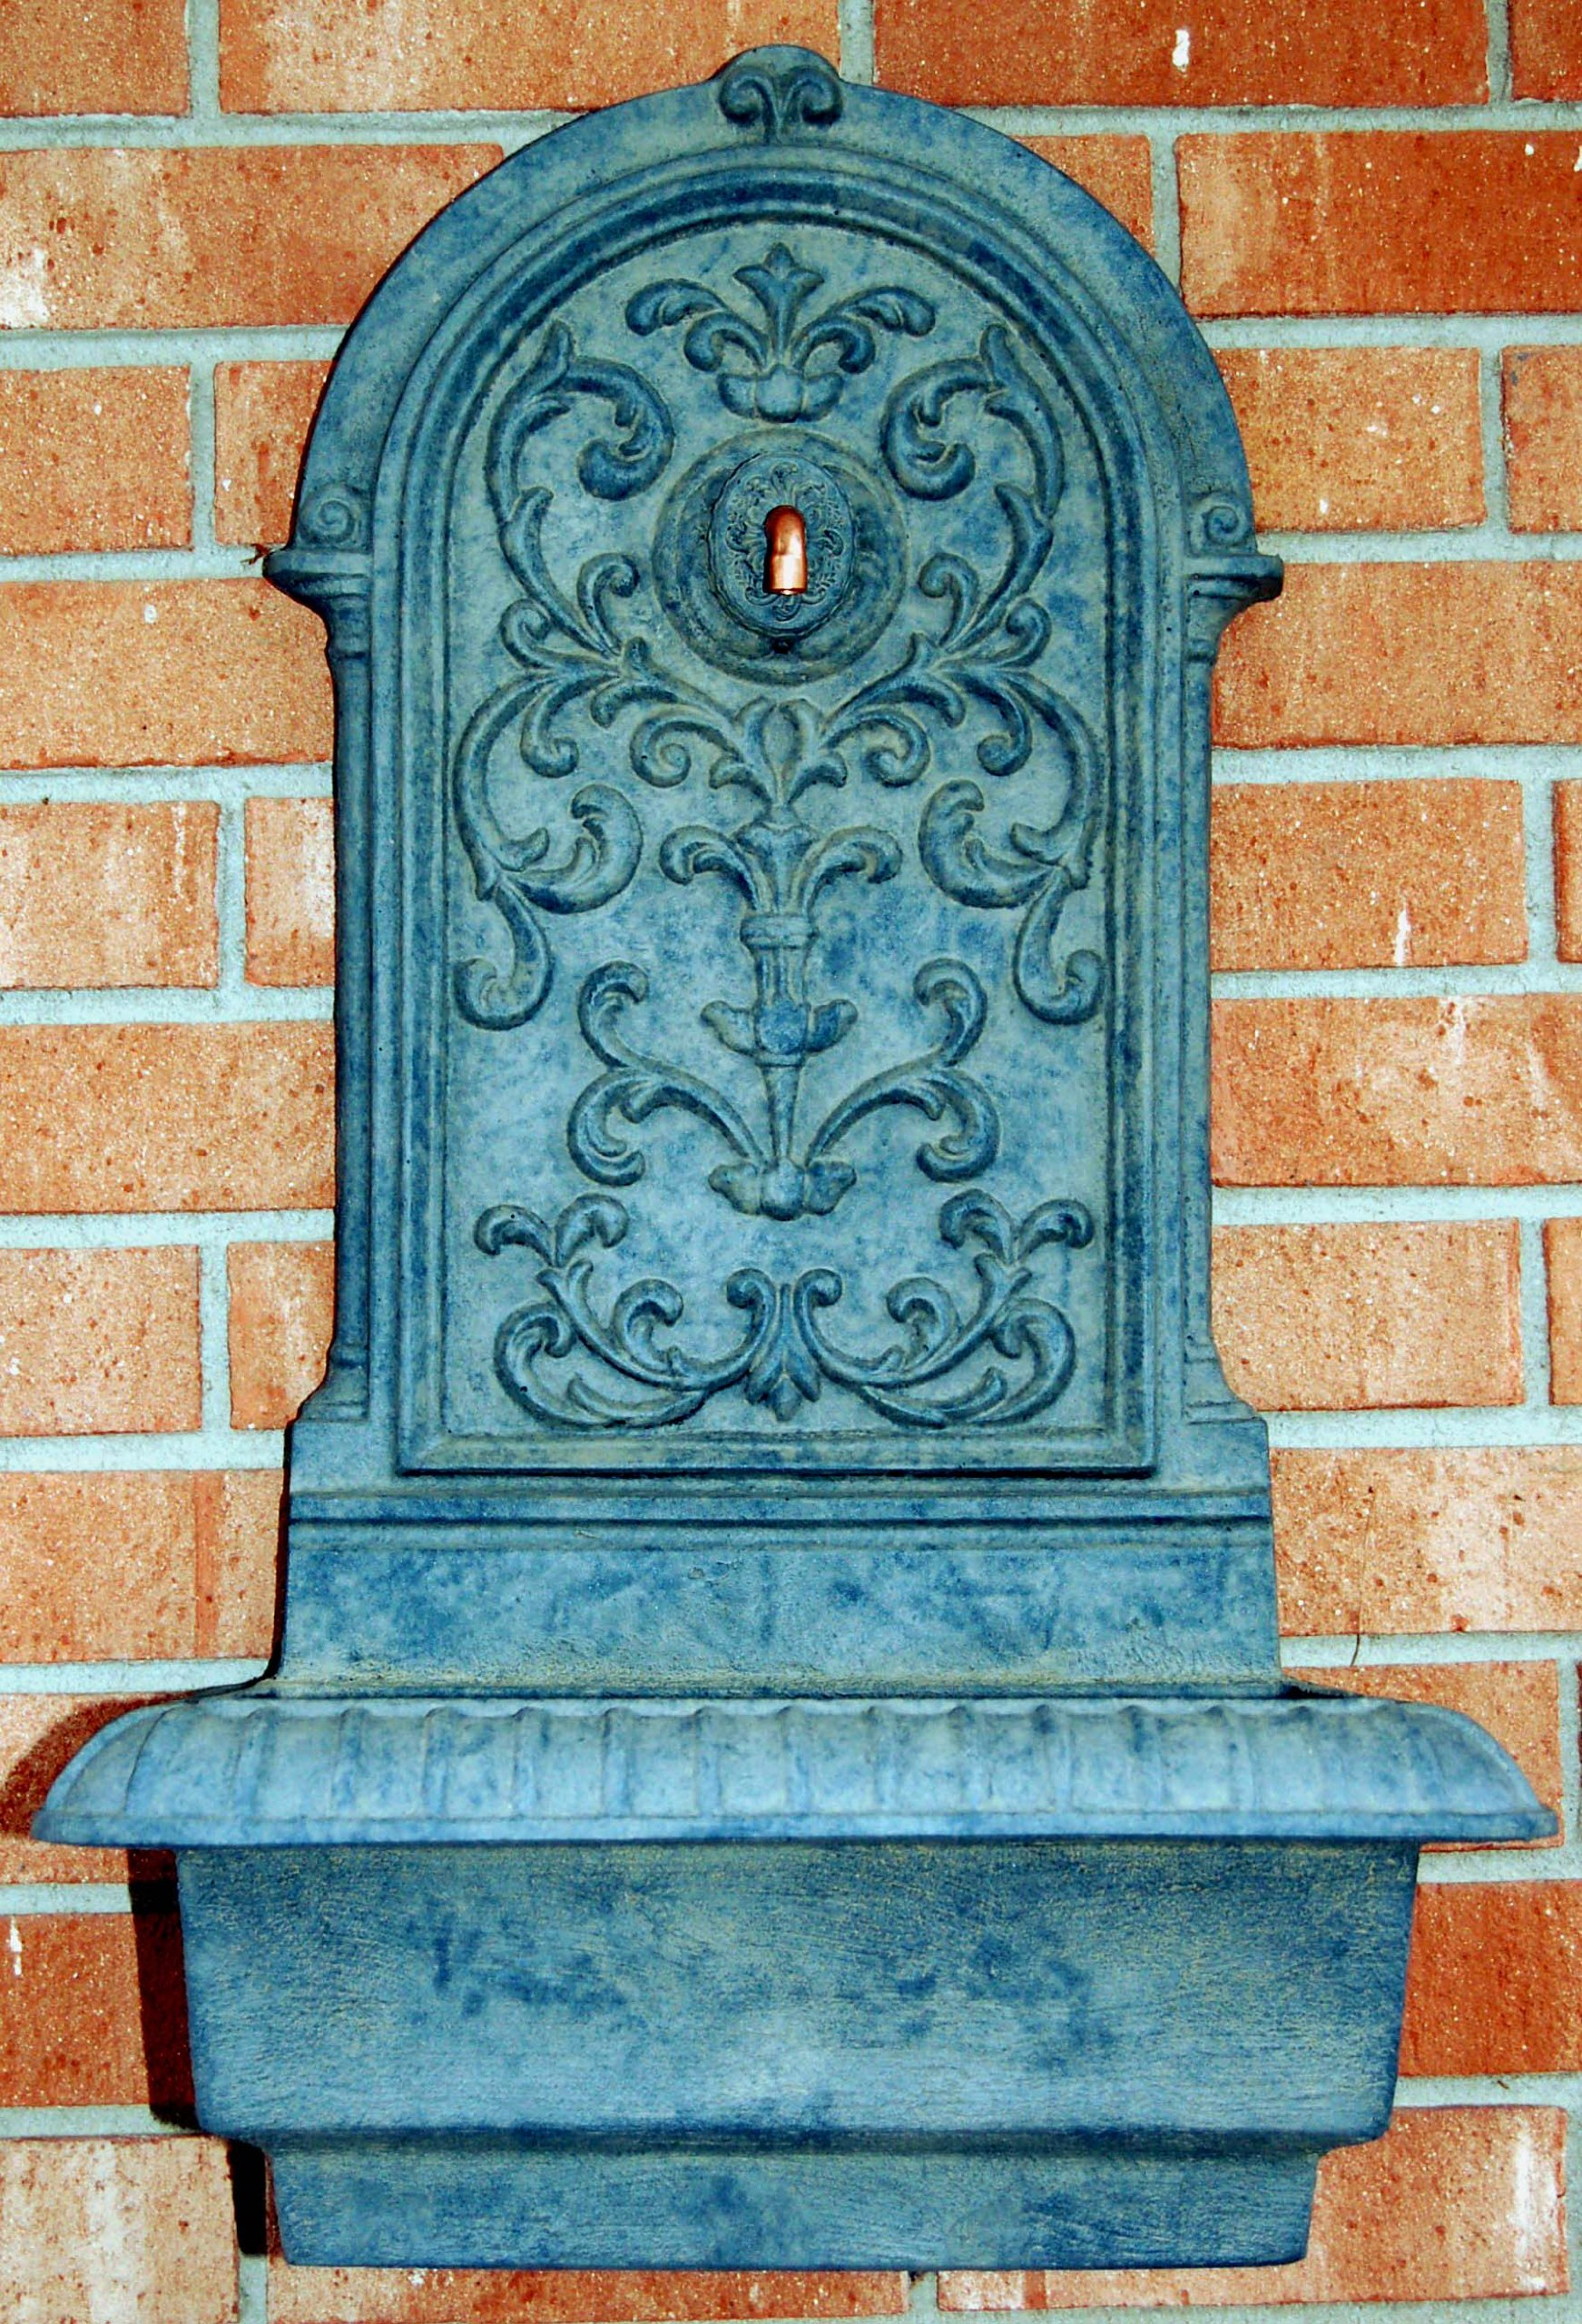 Ladybug Renaissance Wall Fountain, Lead